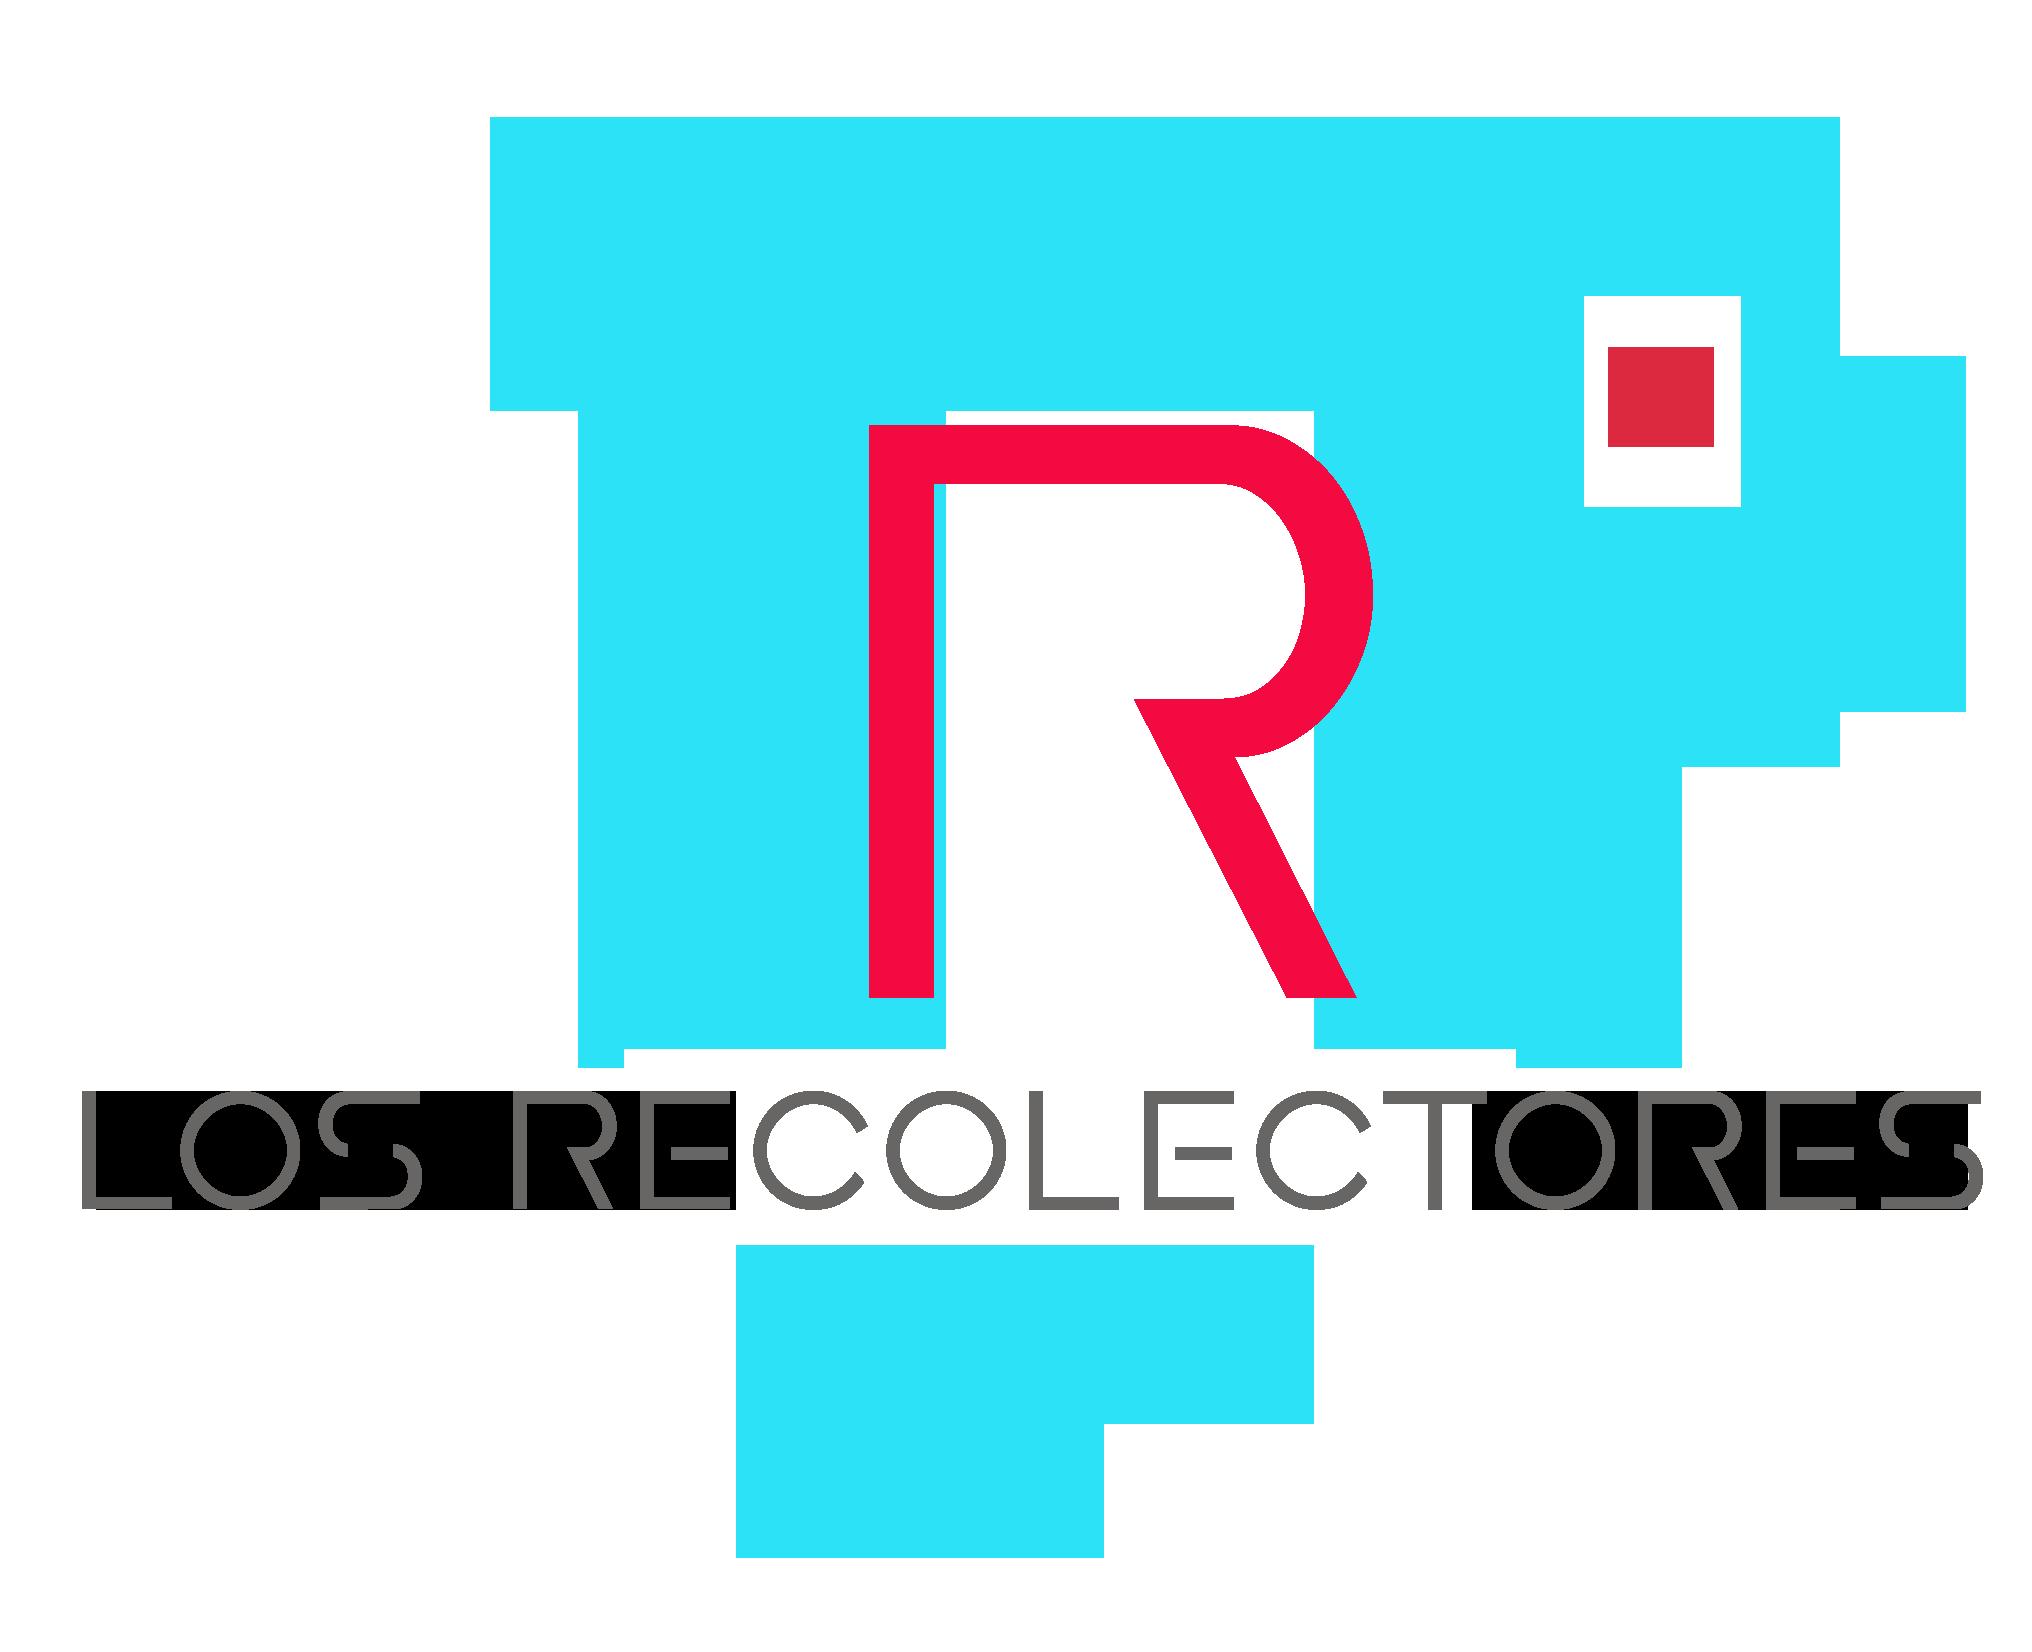 LOGO-RECOLECTORES-PRUEBA.png